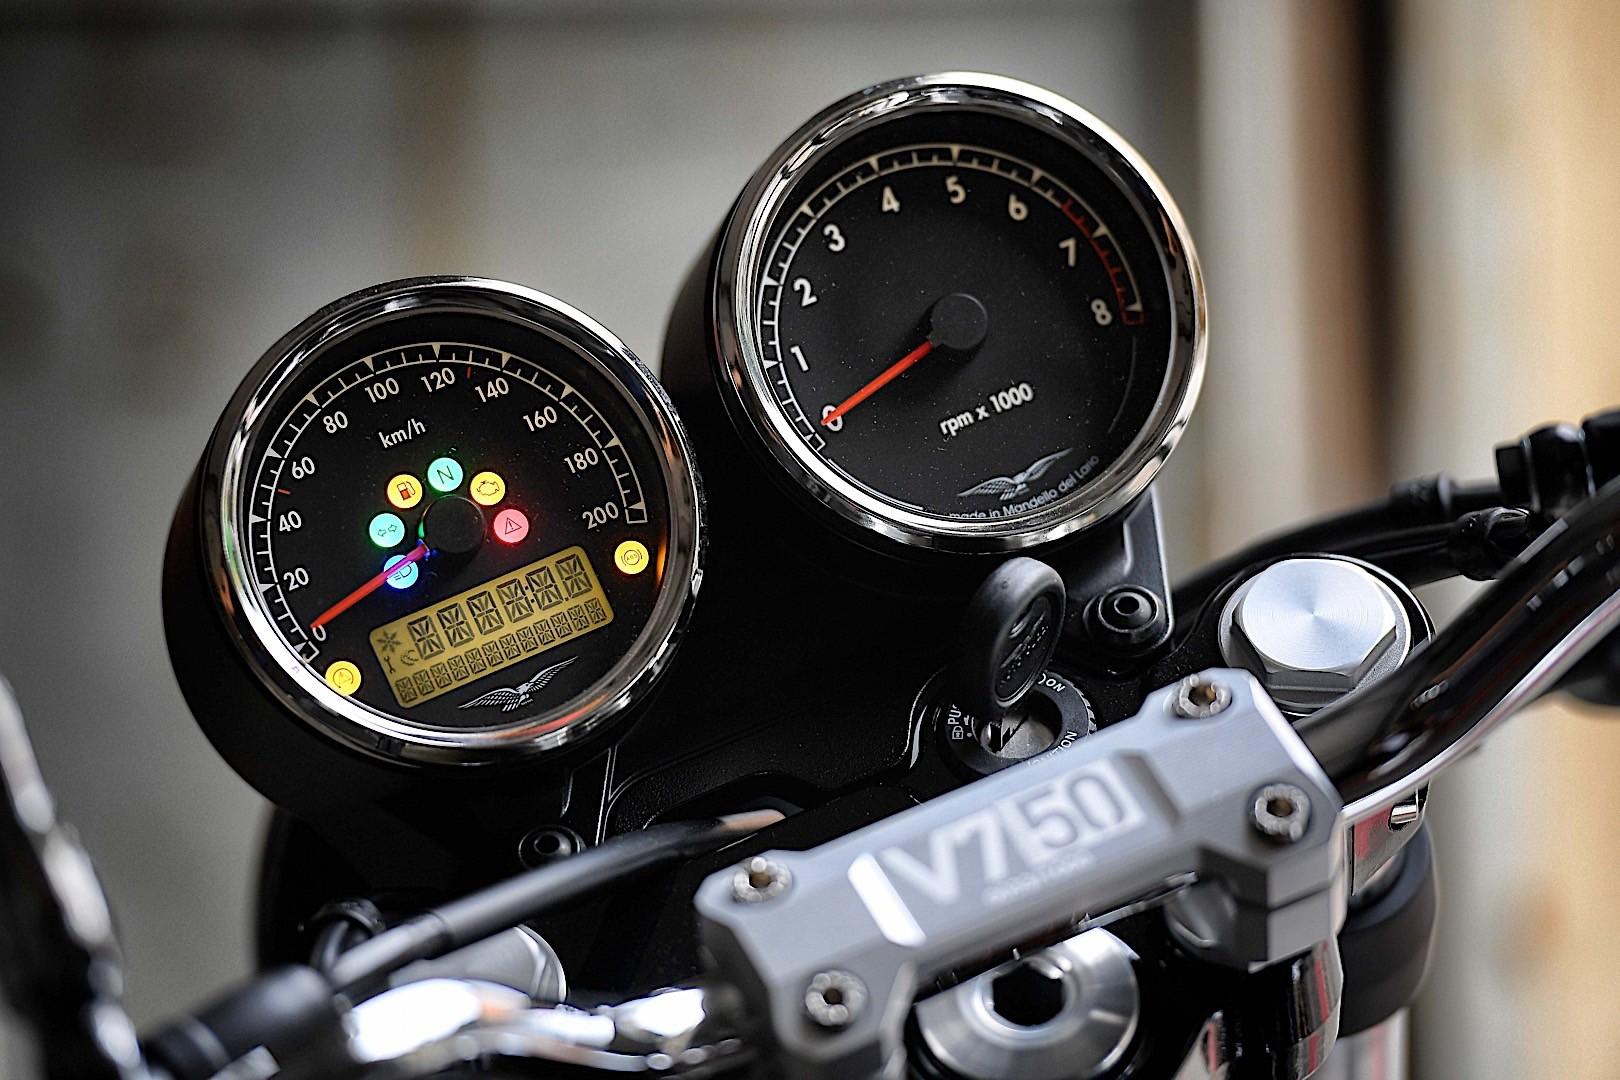 moto guzzi begins u.s. demo tour, test rides included - autoevolution